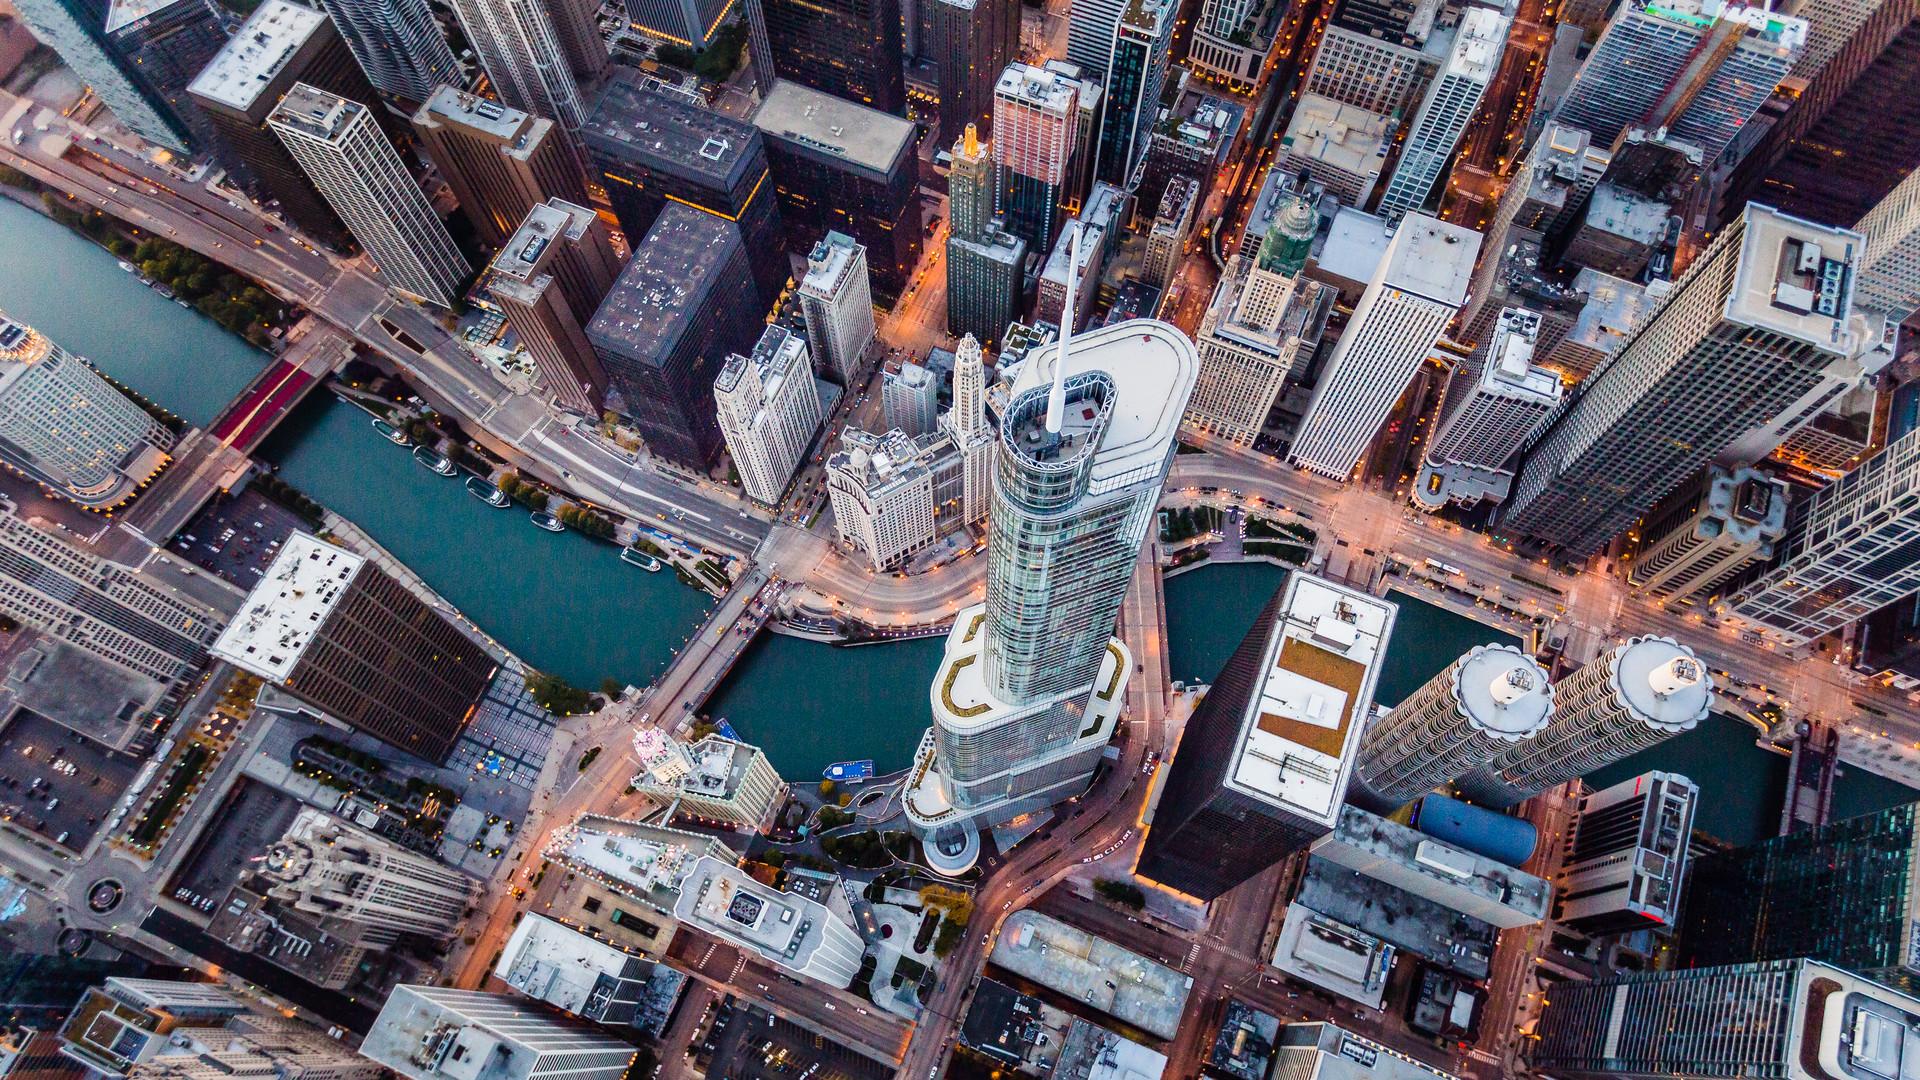 Trump Tower Chicago Aerial